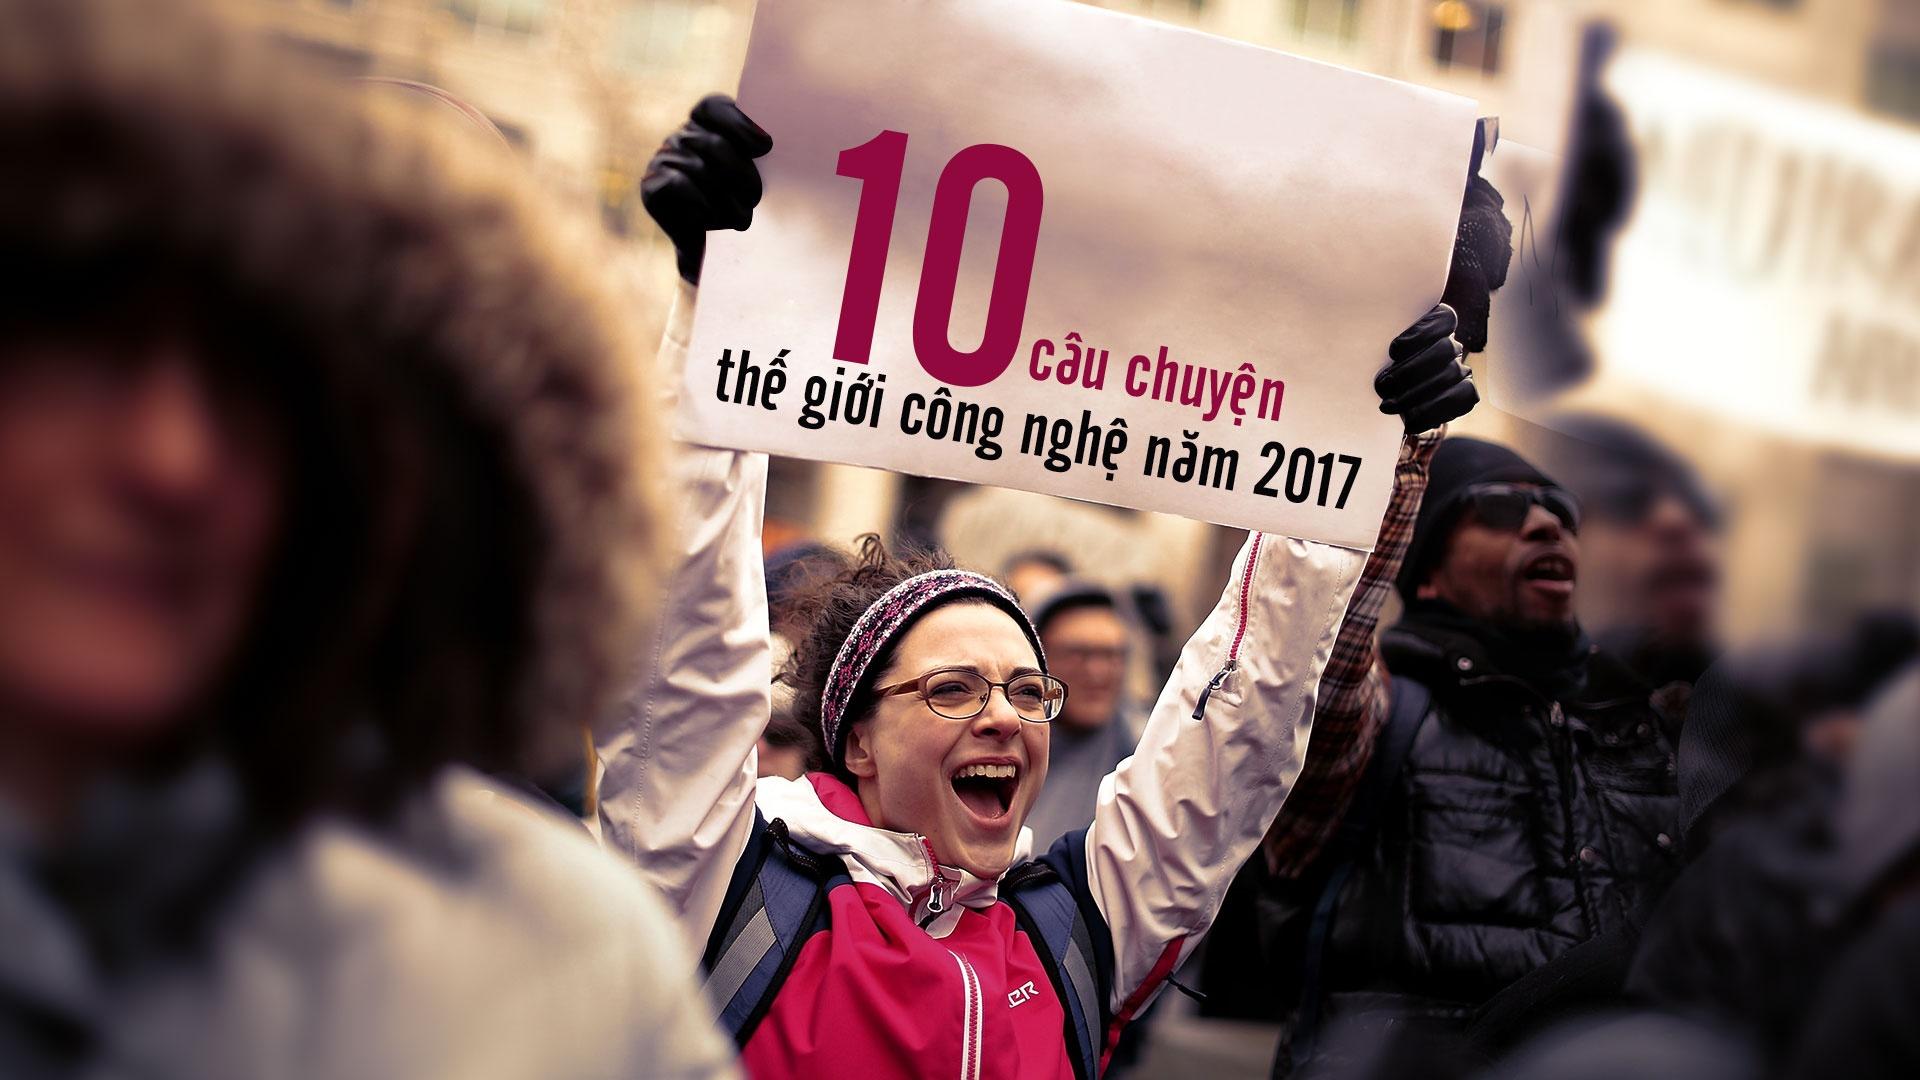 10 cau chuyen the gioi cong nghe nam 2017 hinh anh 1